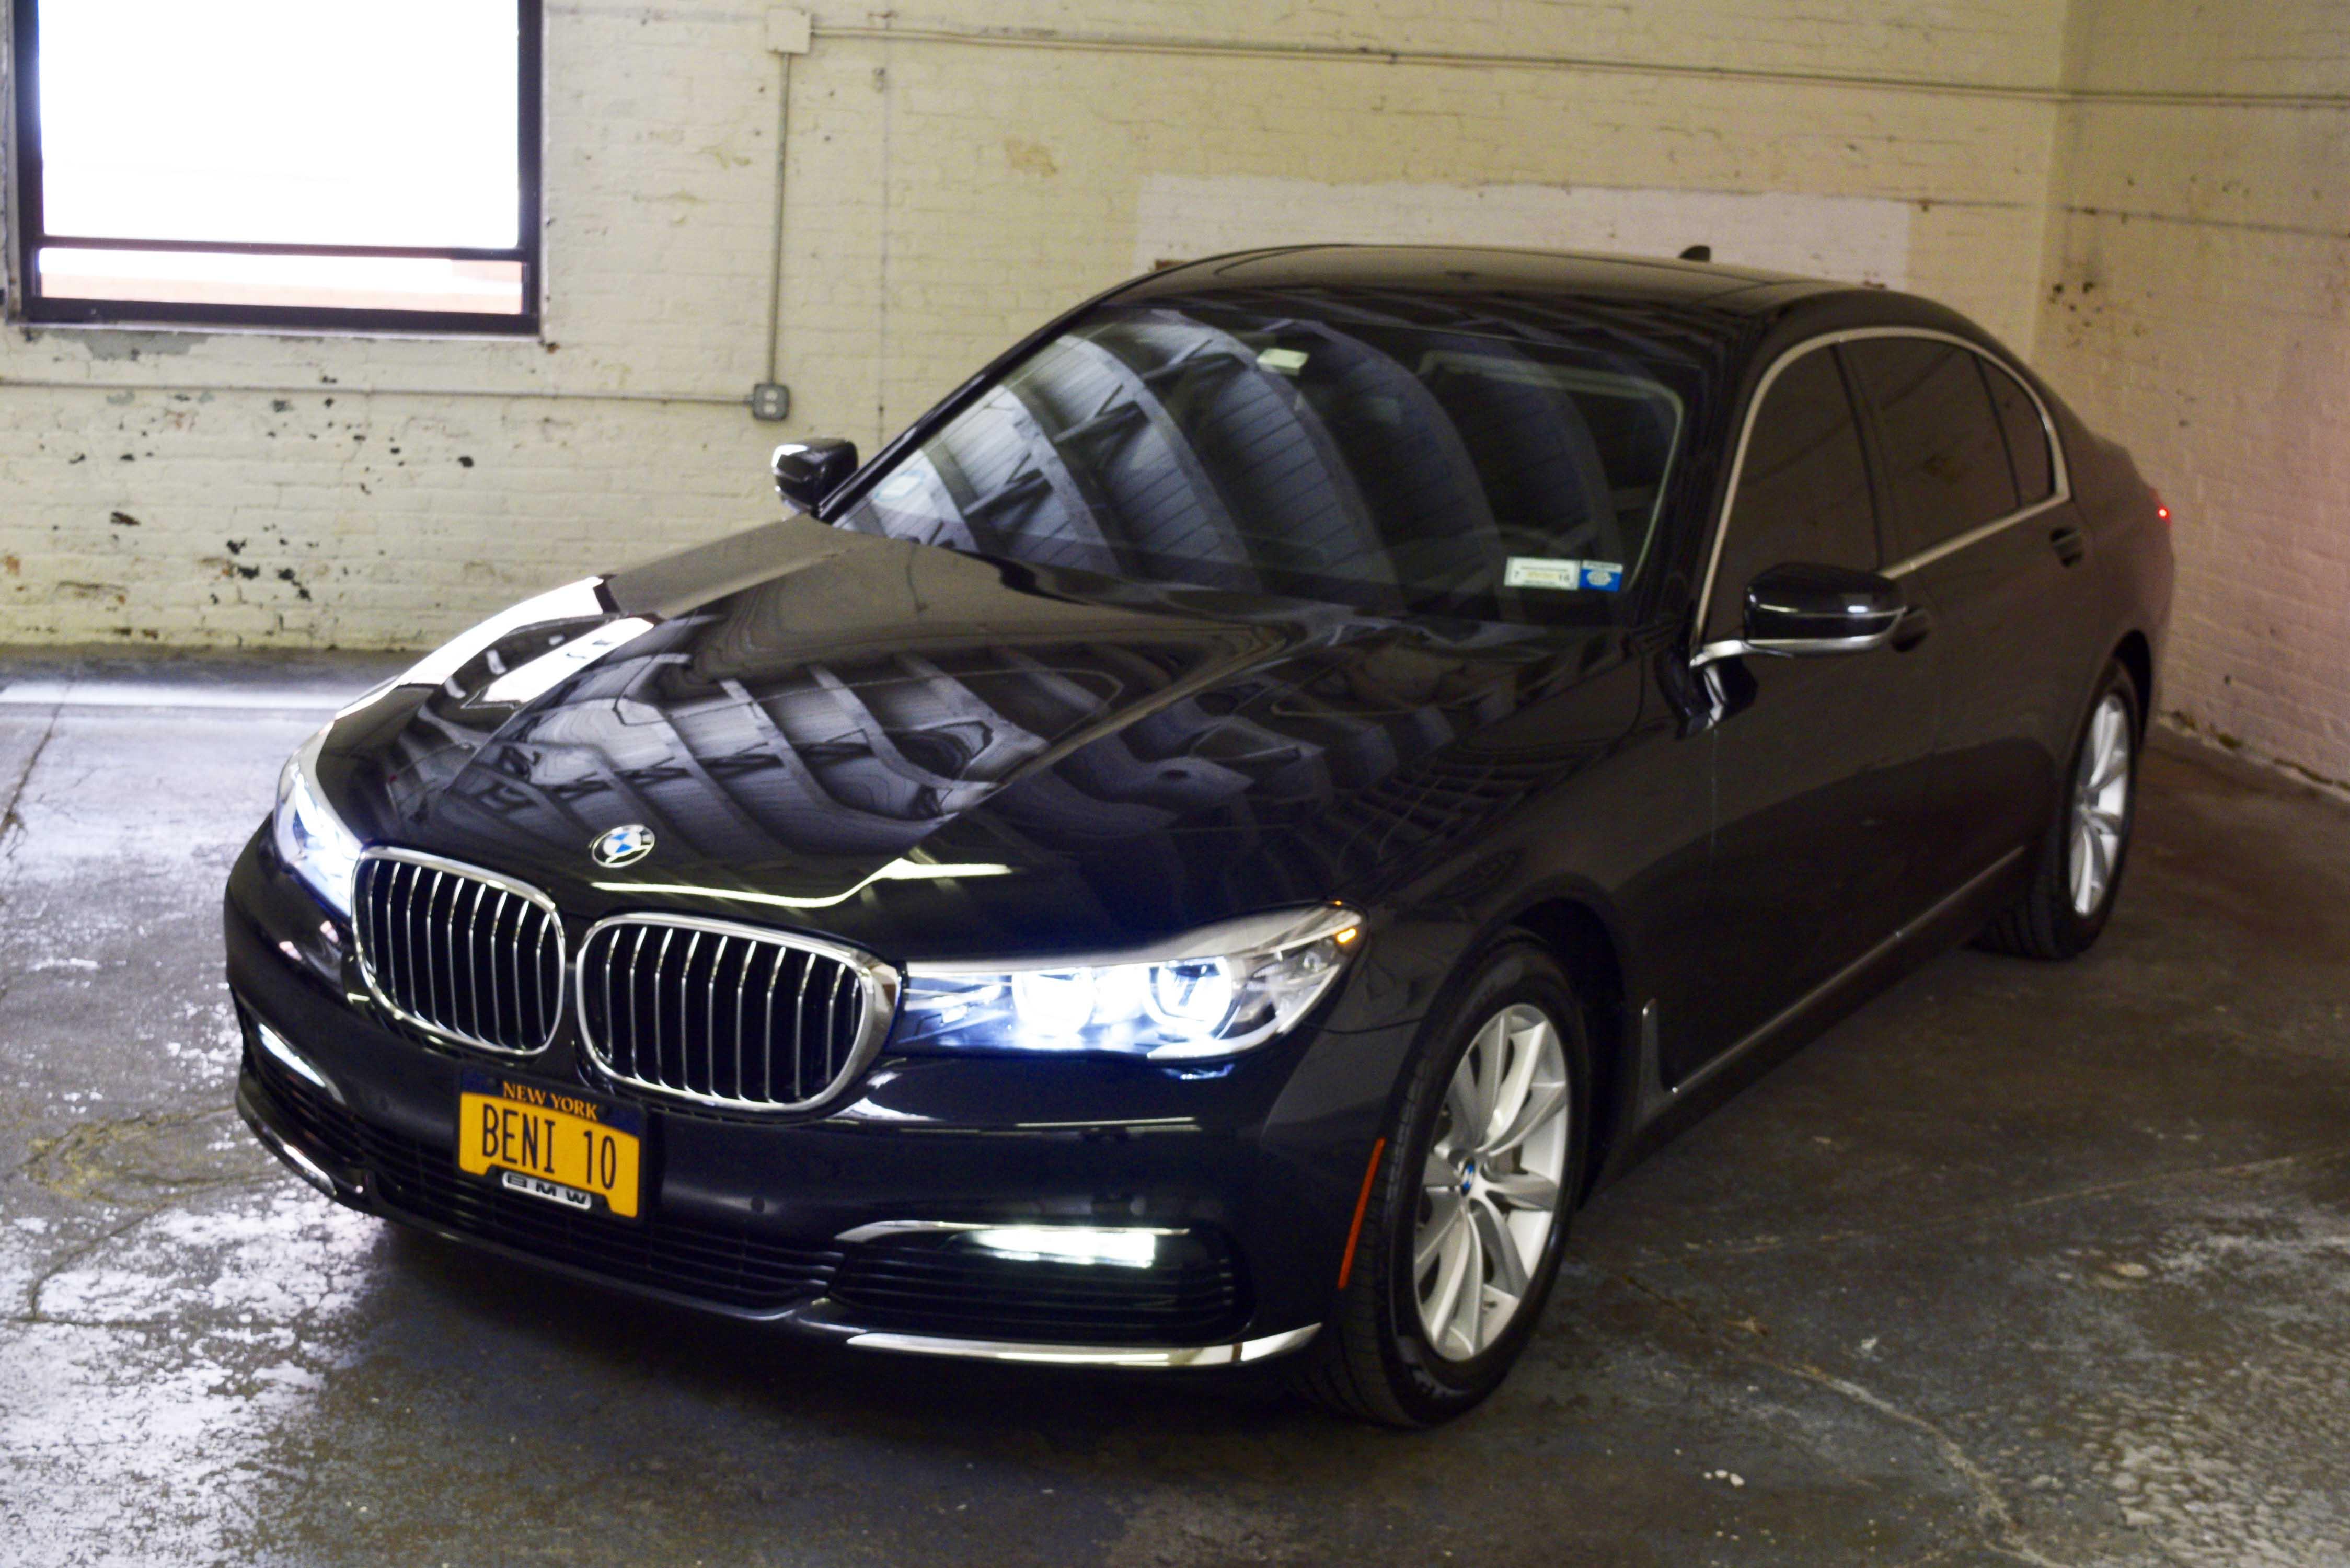 Beni_BMW_7series_exterior2